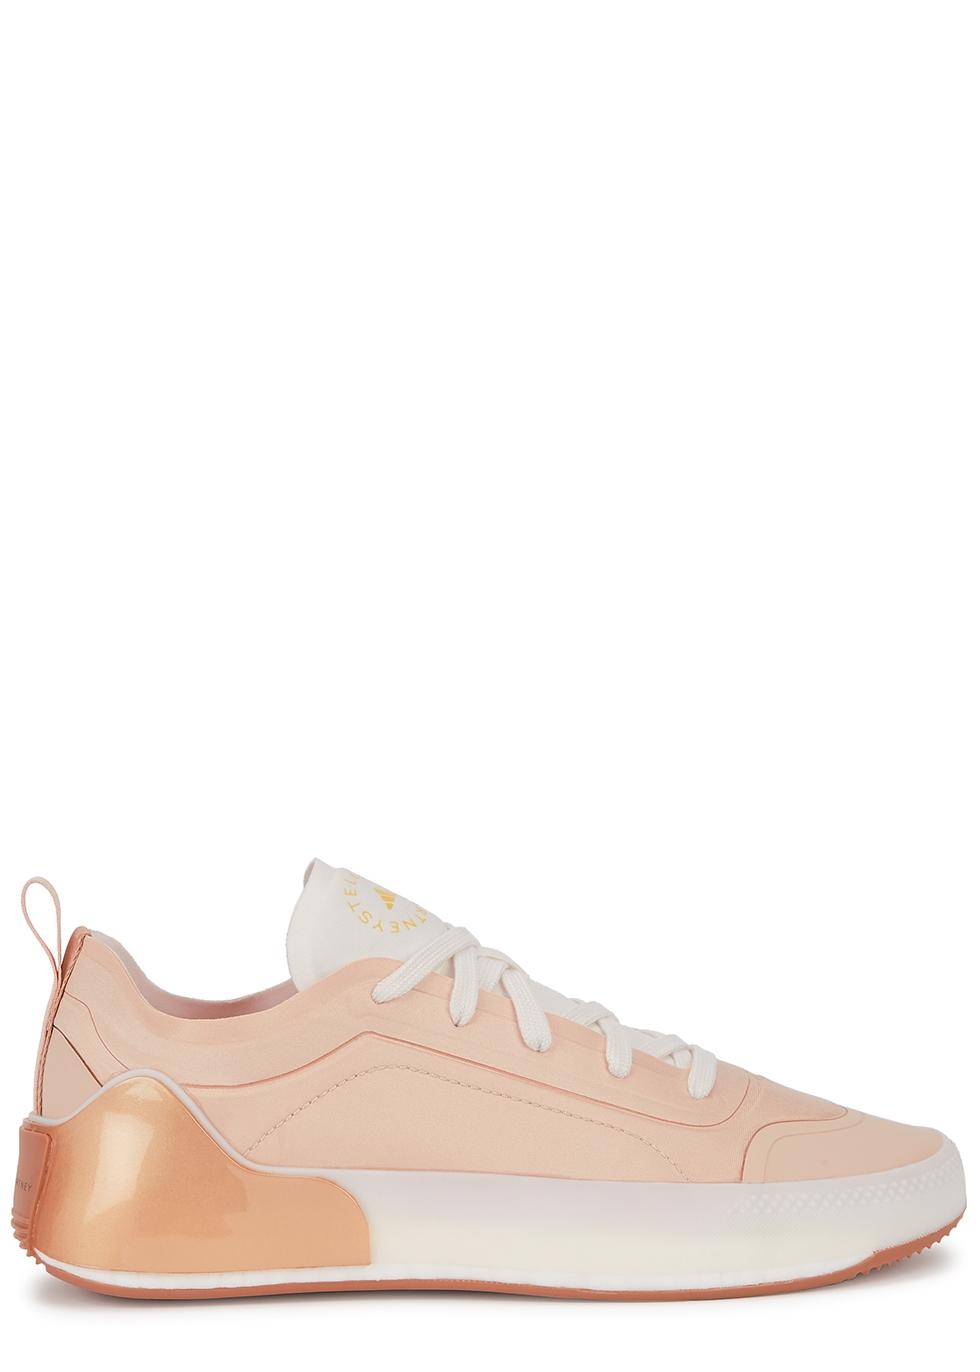 Treino light pink Primegreen sneakers